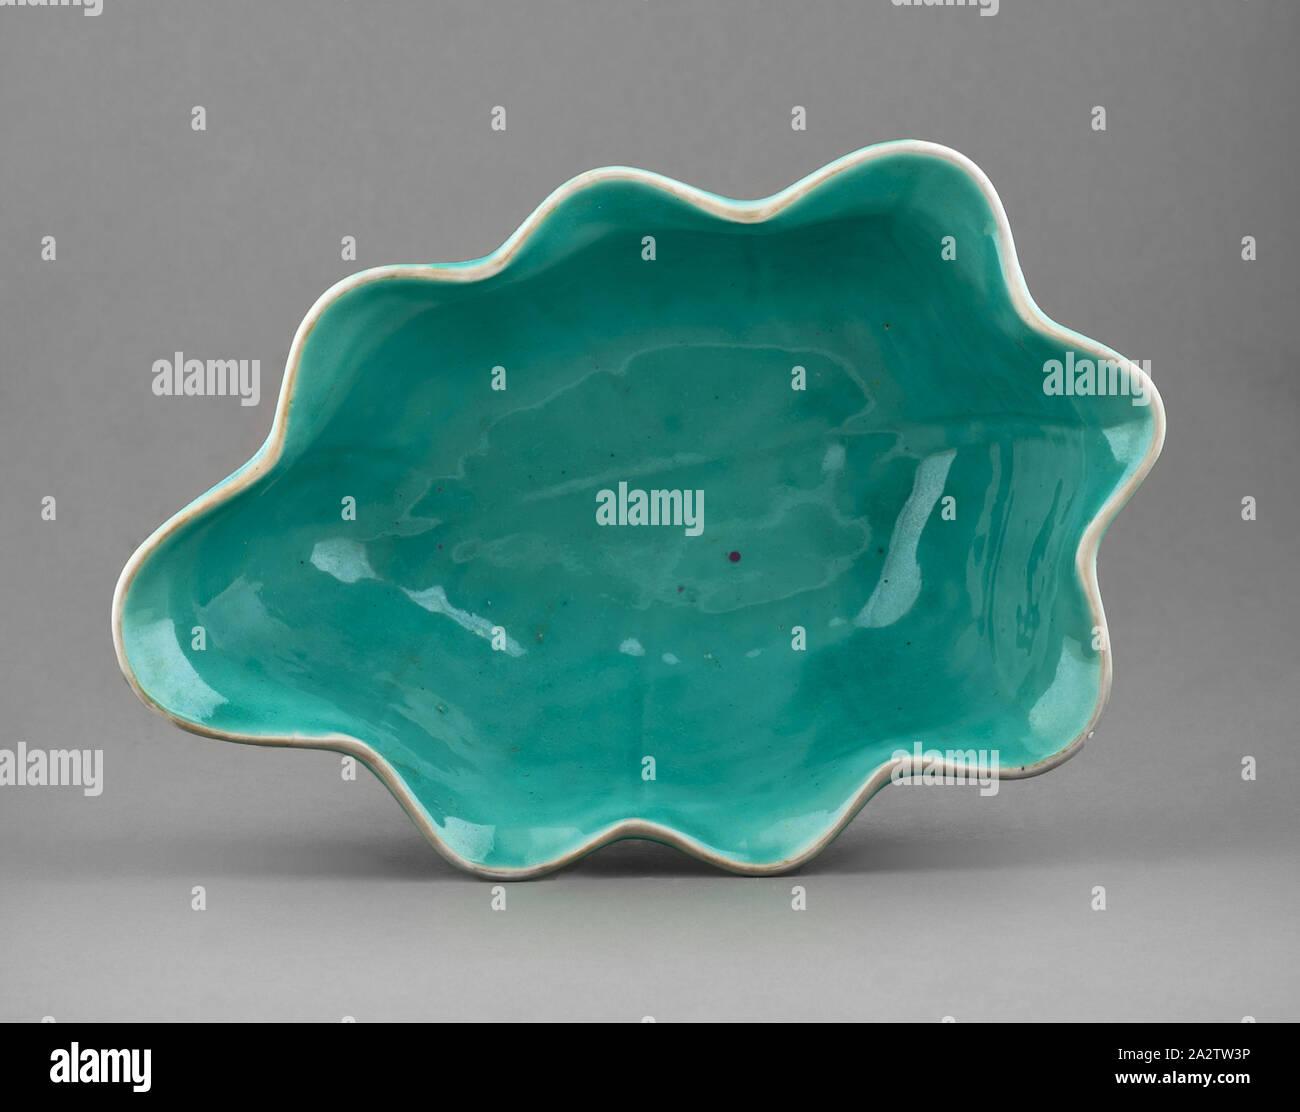 bowl, 7-7, porcelain, enamel, 7-7/7 x 7 x 7-7/7 in., Asian